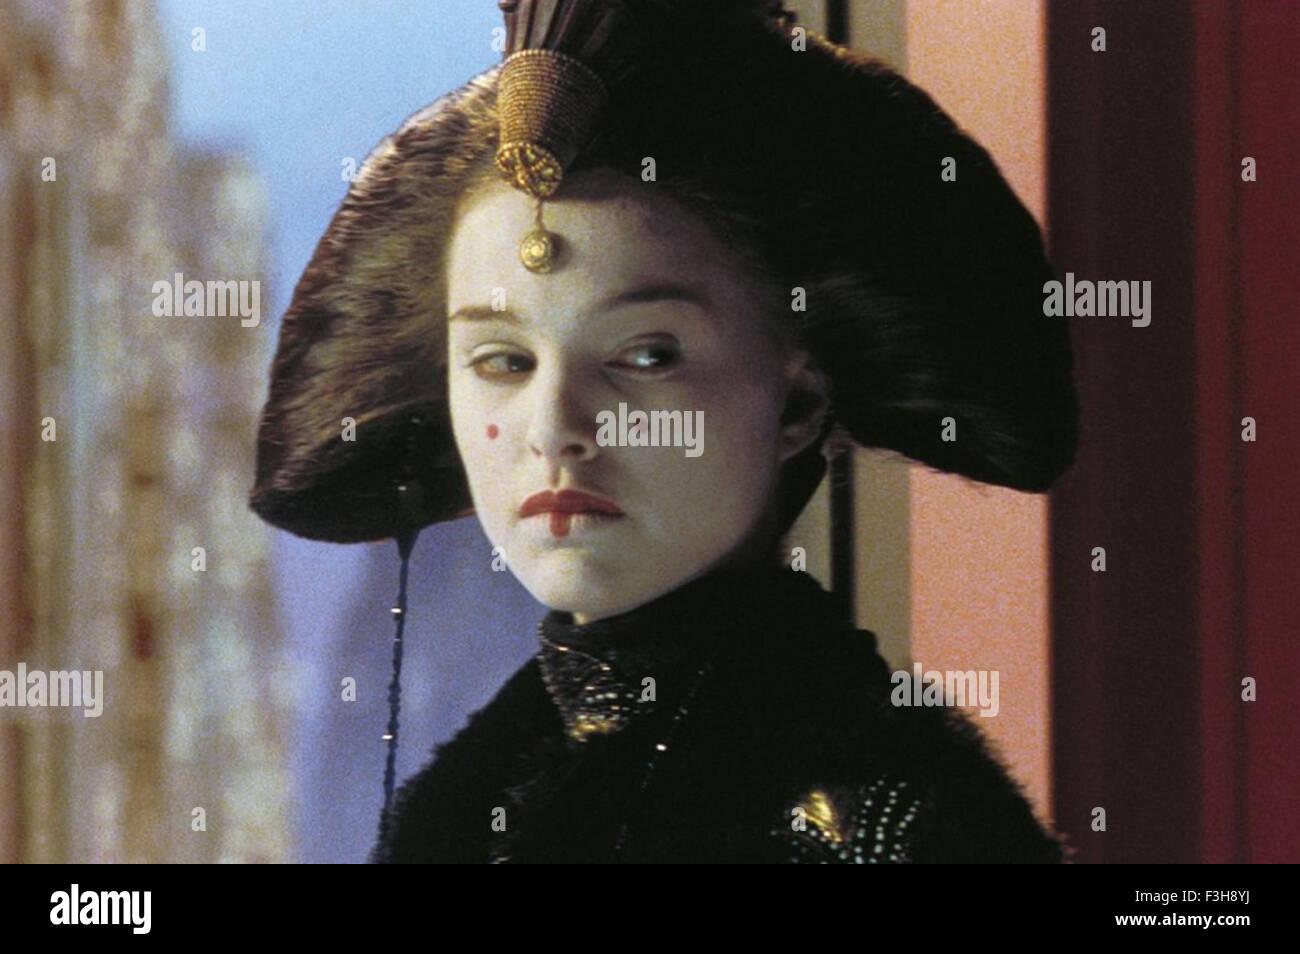 STAR WARS: EPISODE 1 - THE PHANTOM MENACE  1999 Lucasfilm production with Natalie Portman - Stock Image